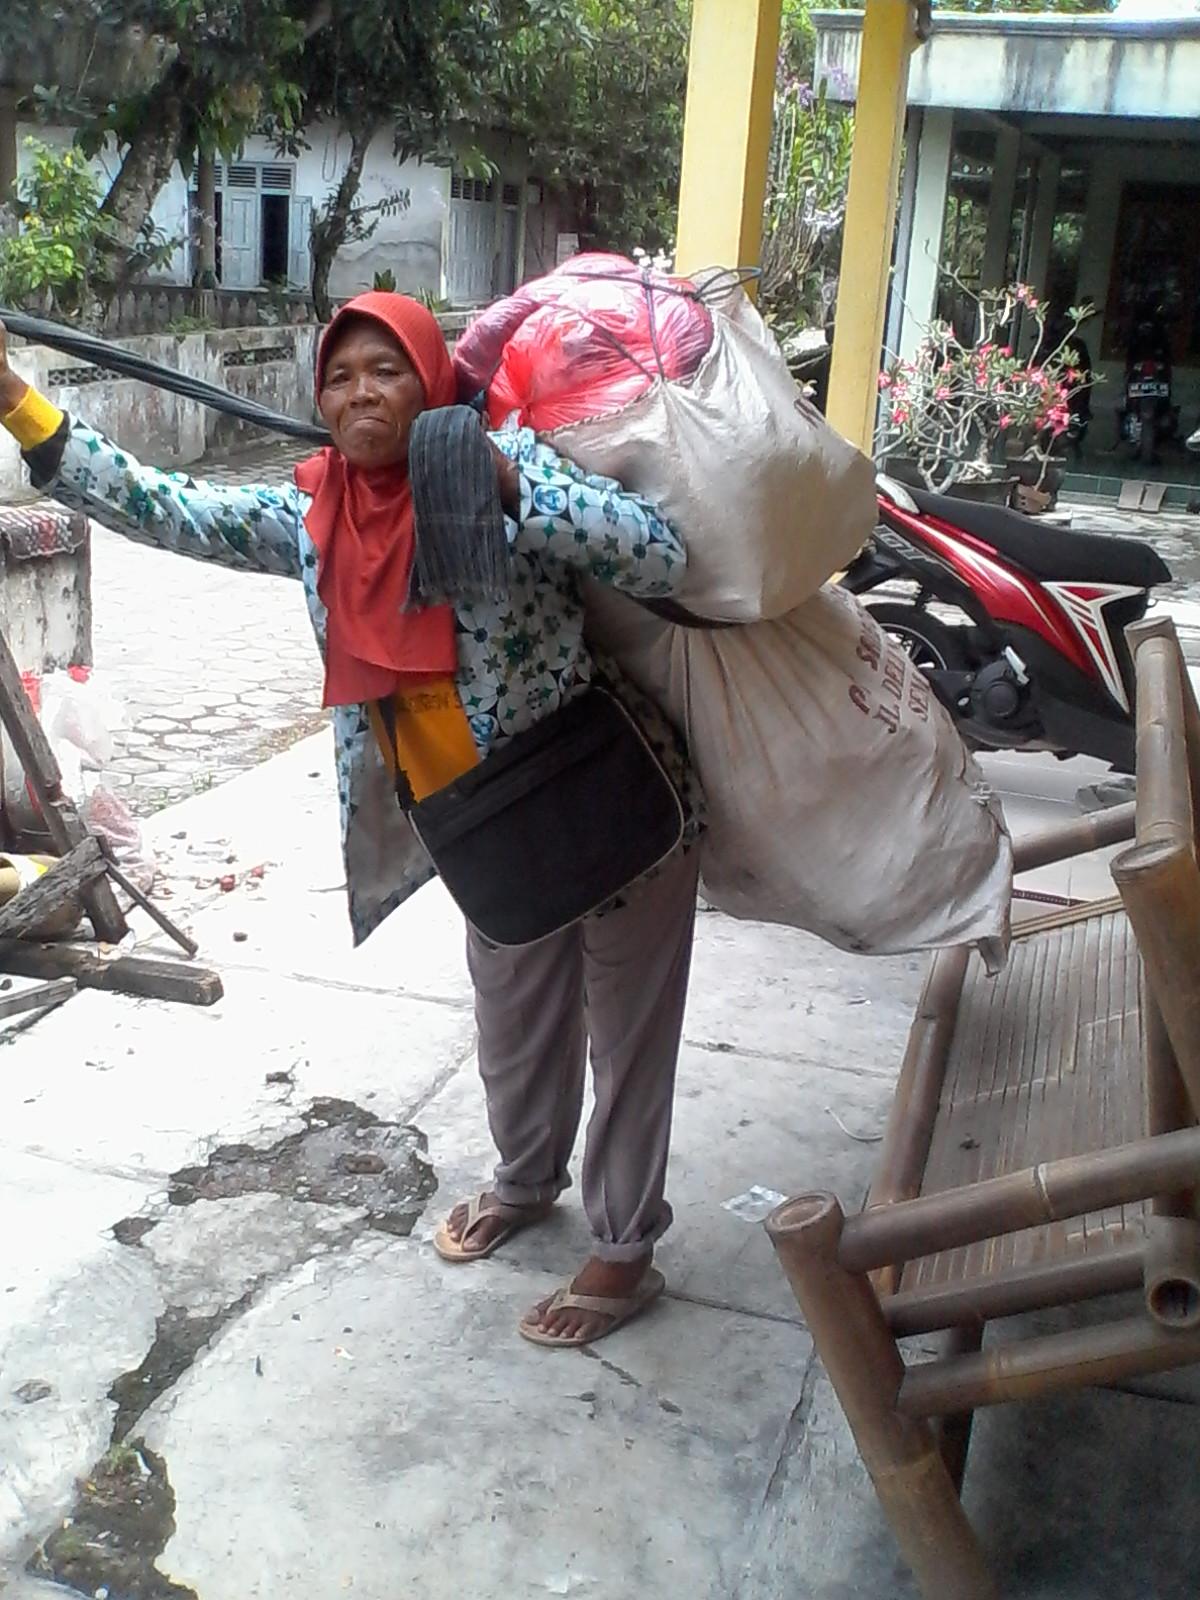 Mbah Wiji kuat menggendong 1 karung rongsok demi 1 kg beras